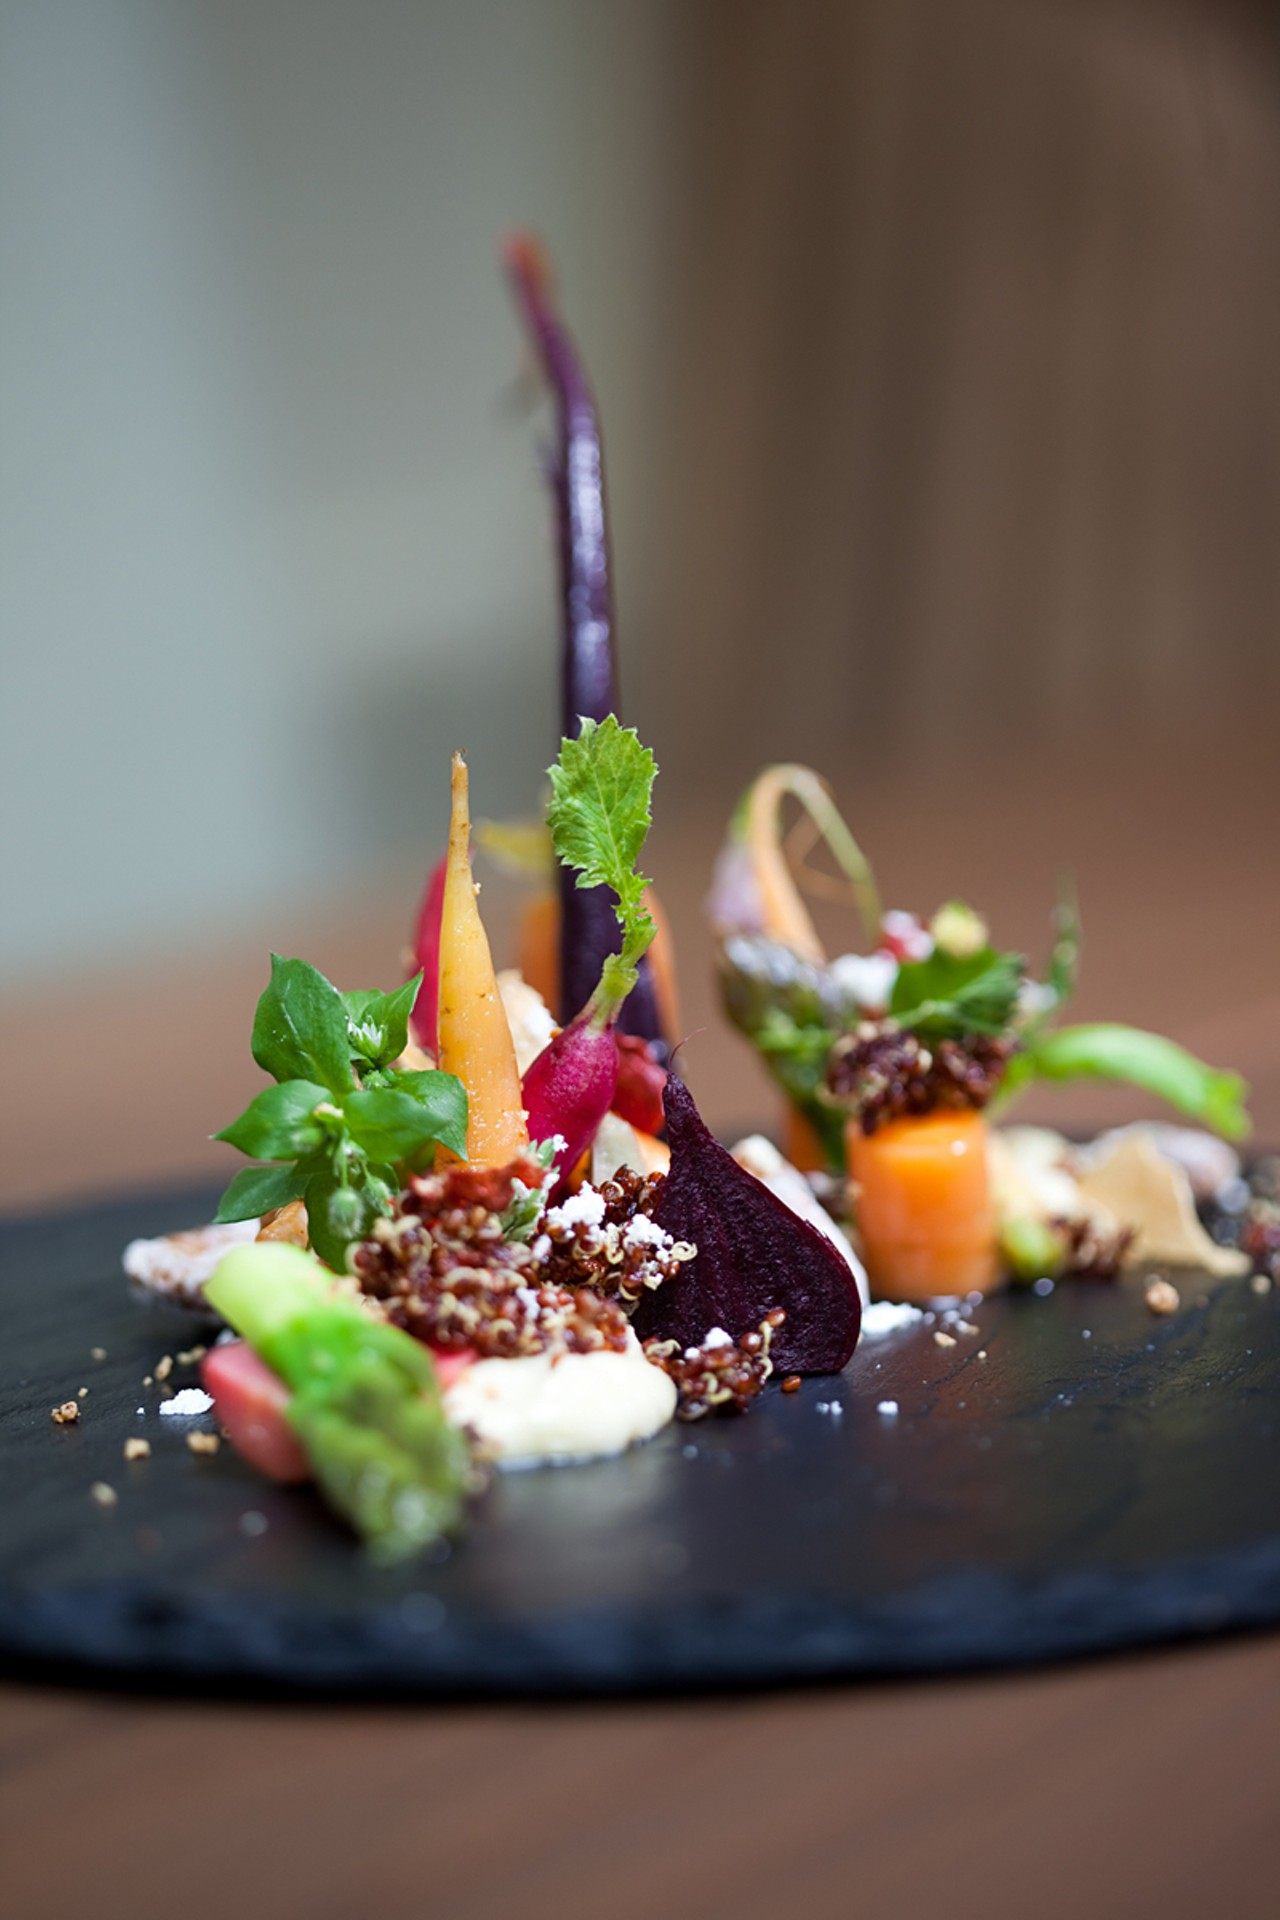 Chef Garden: Atelier Crenn: Beautiful Food Falls Short